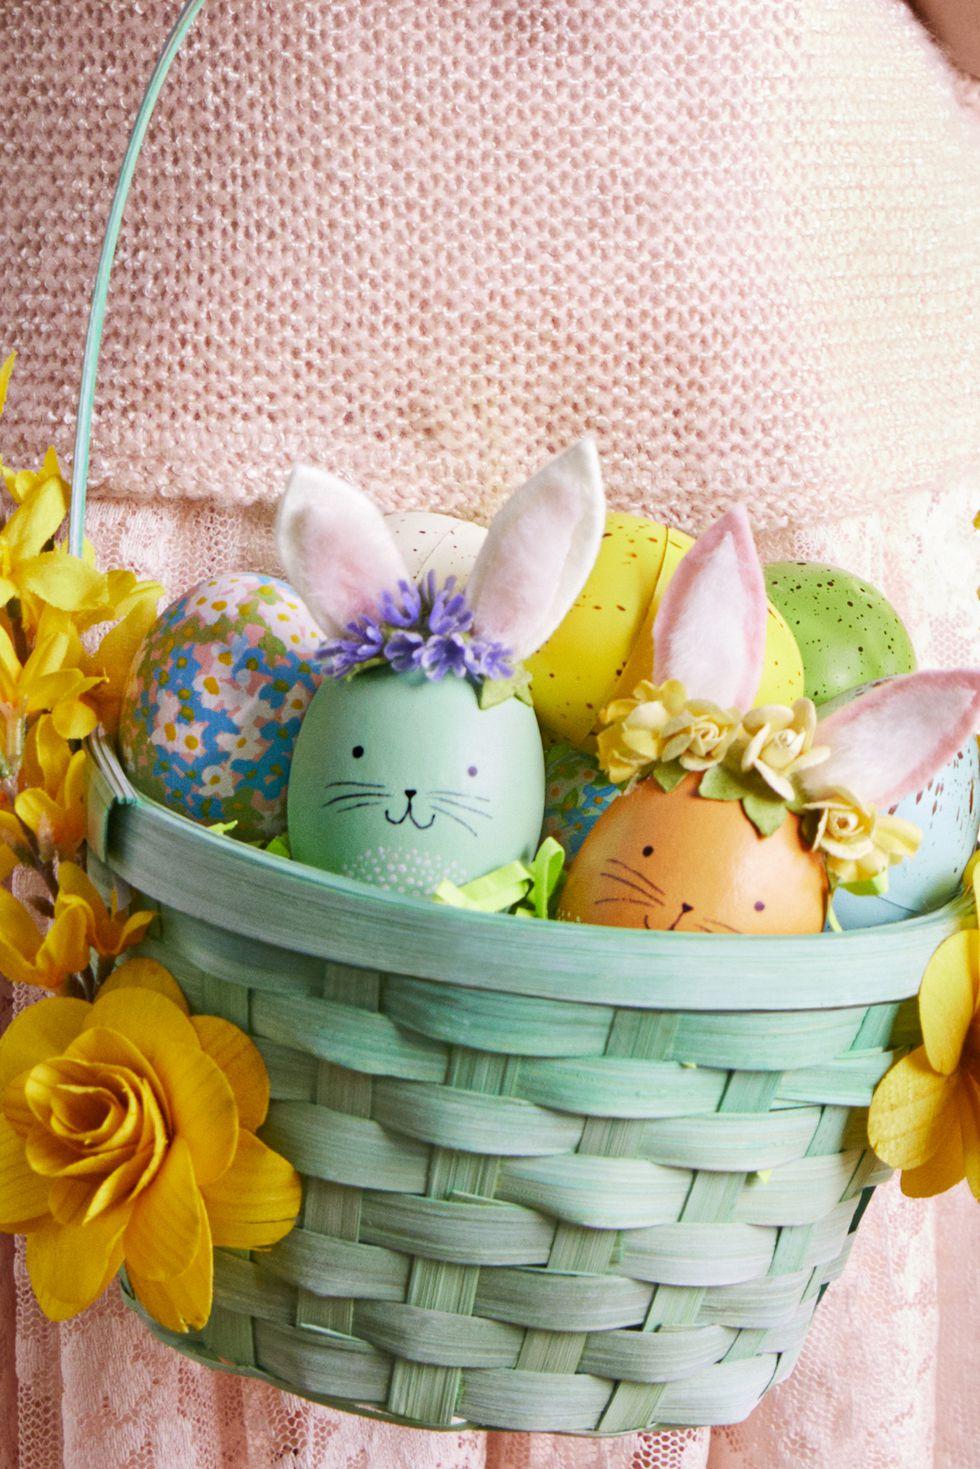 замечено, идеи для украшения яиц на пасху фото творческих отчетах поселений